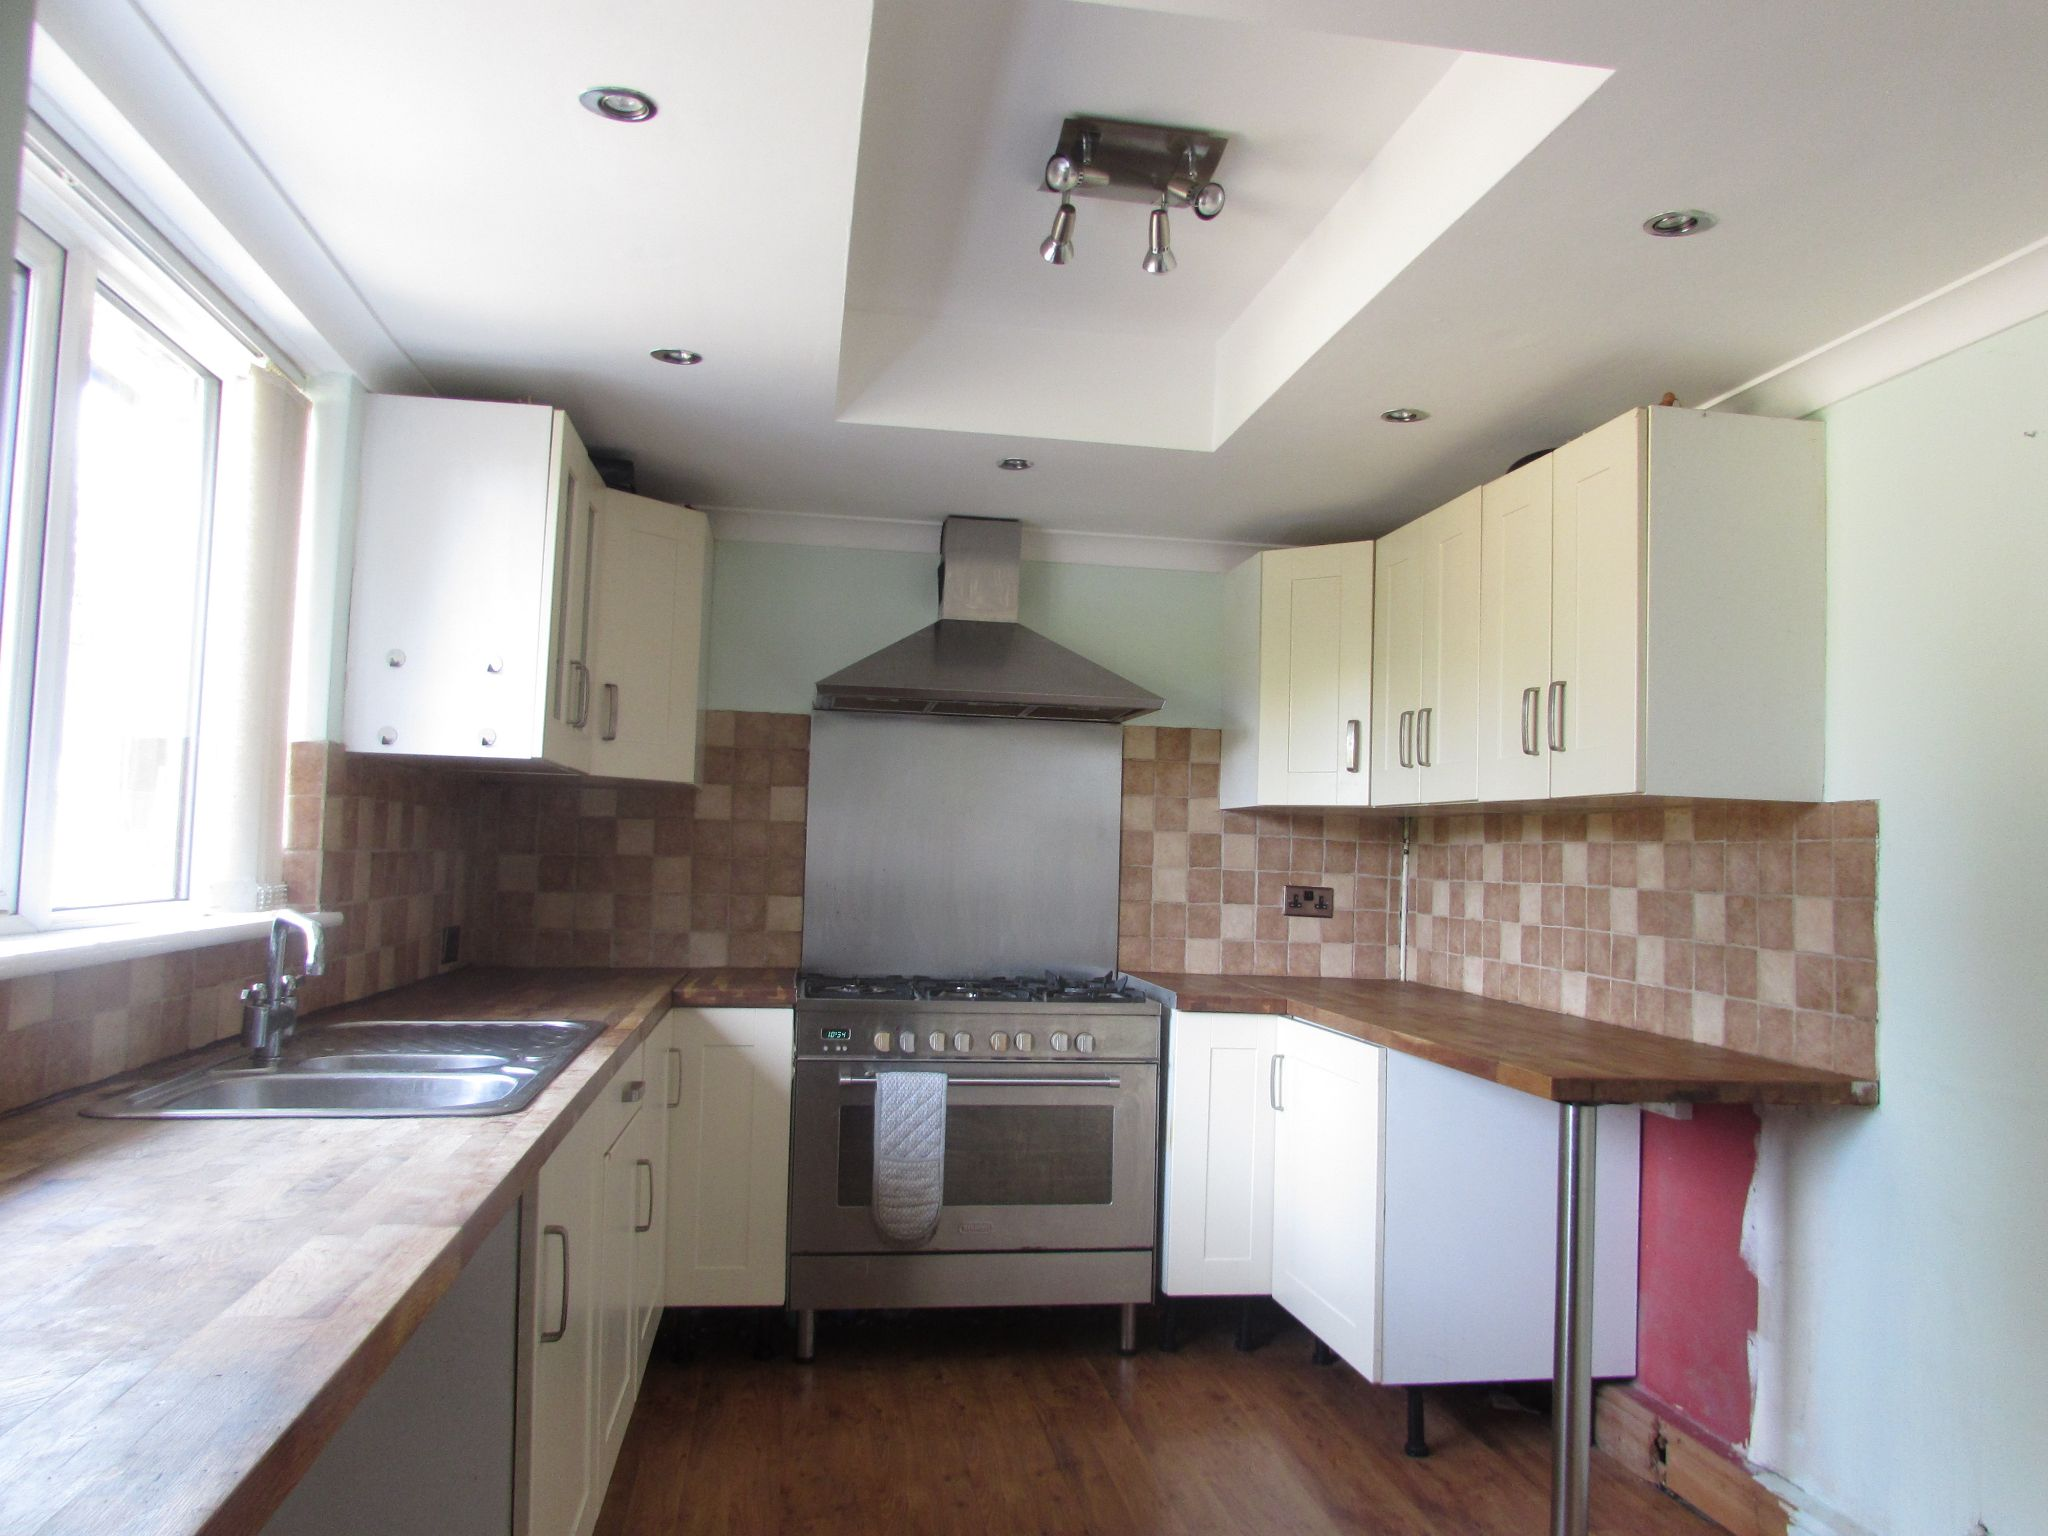 3 Bedroom Semi-detached House For Sale - Kitchen